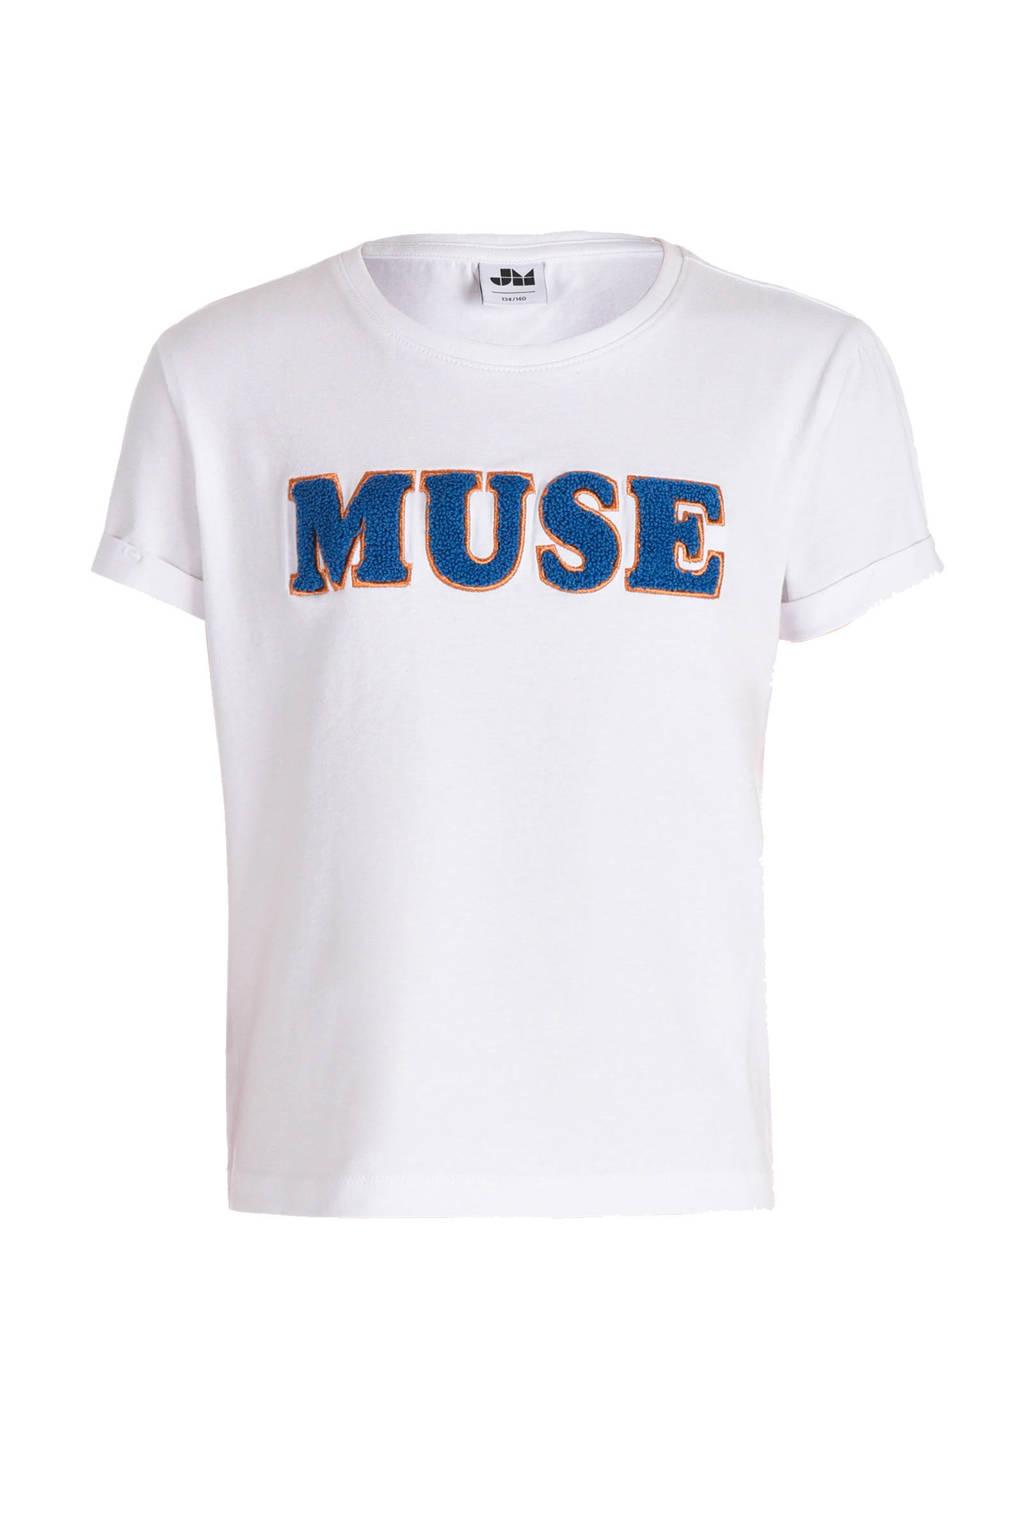 JILL MITCH T-shirt met tekst en borduursels wit/donkerblauw/goud, Wit/donkerblauw/goud